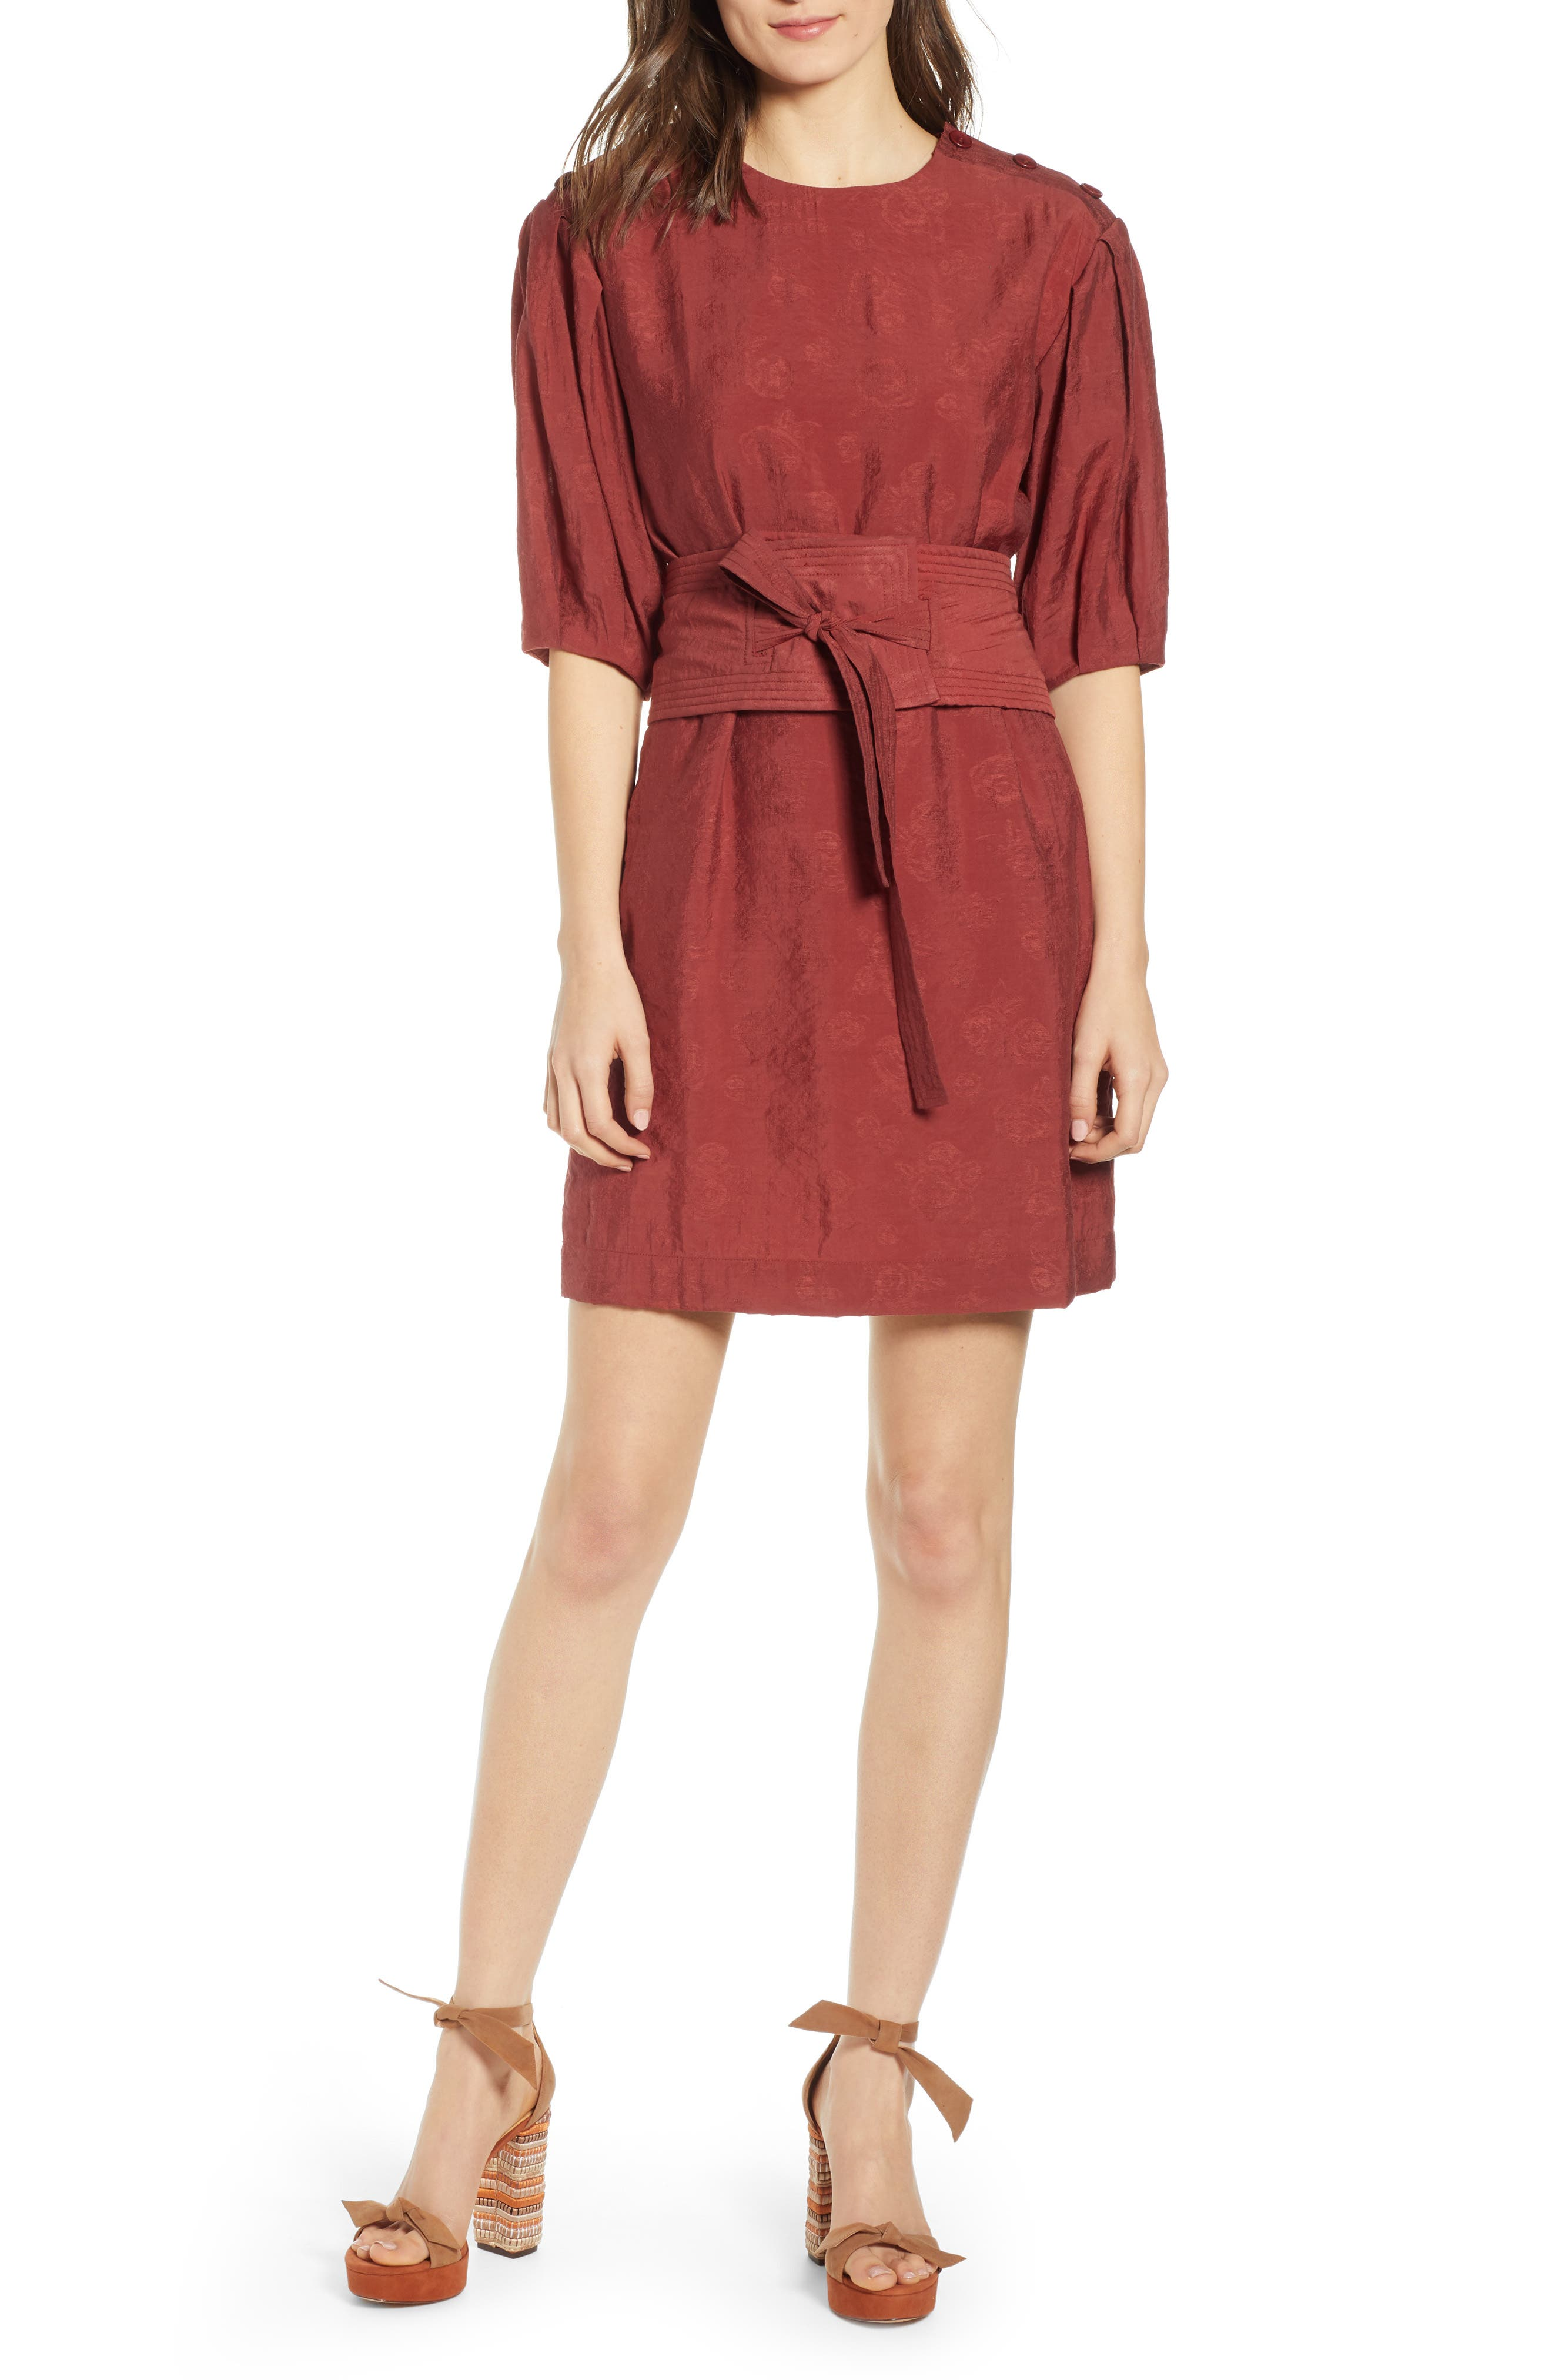 Rebecca Minkoff Juno Dress, Red